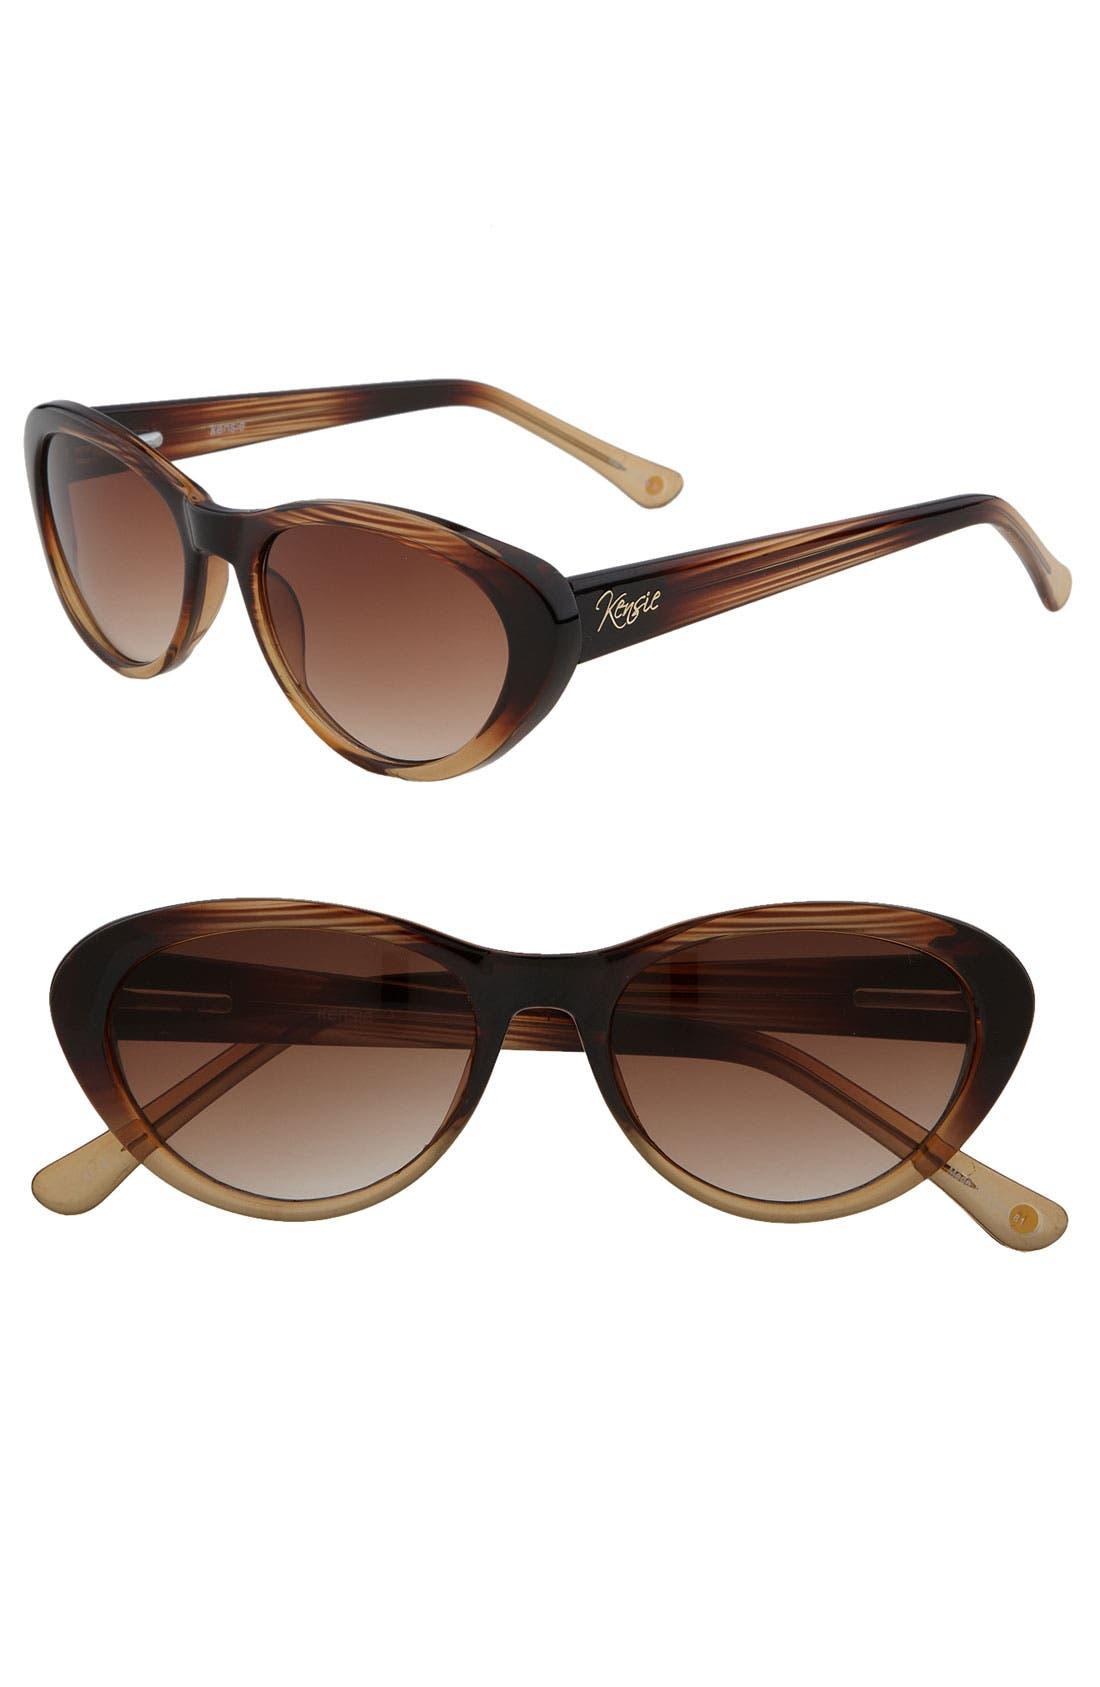 'Portia' Cat's Eye Sunglasses, Main, color, 200